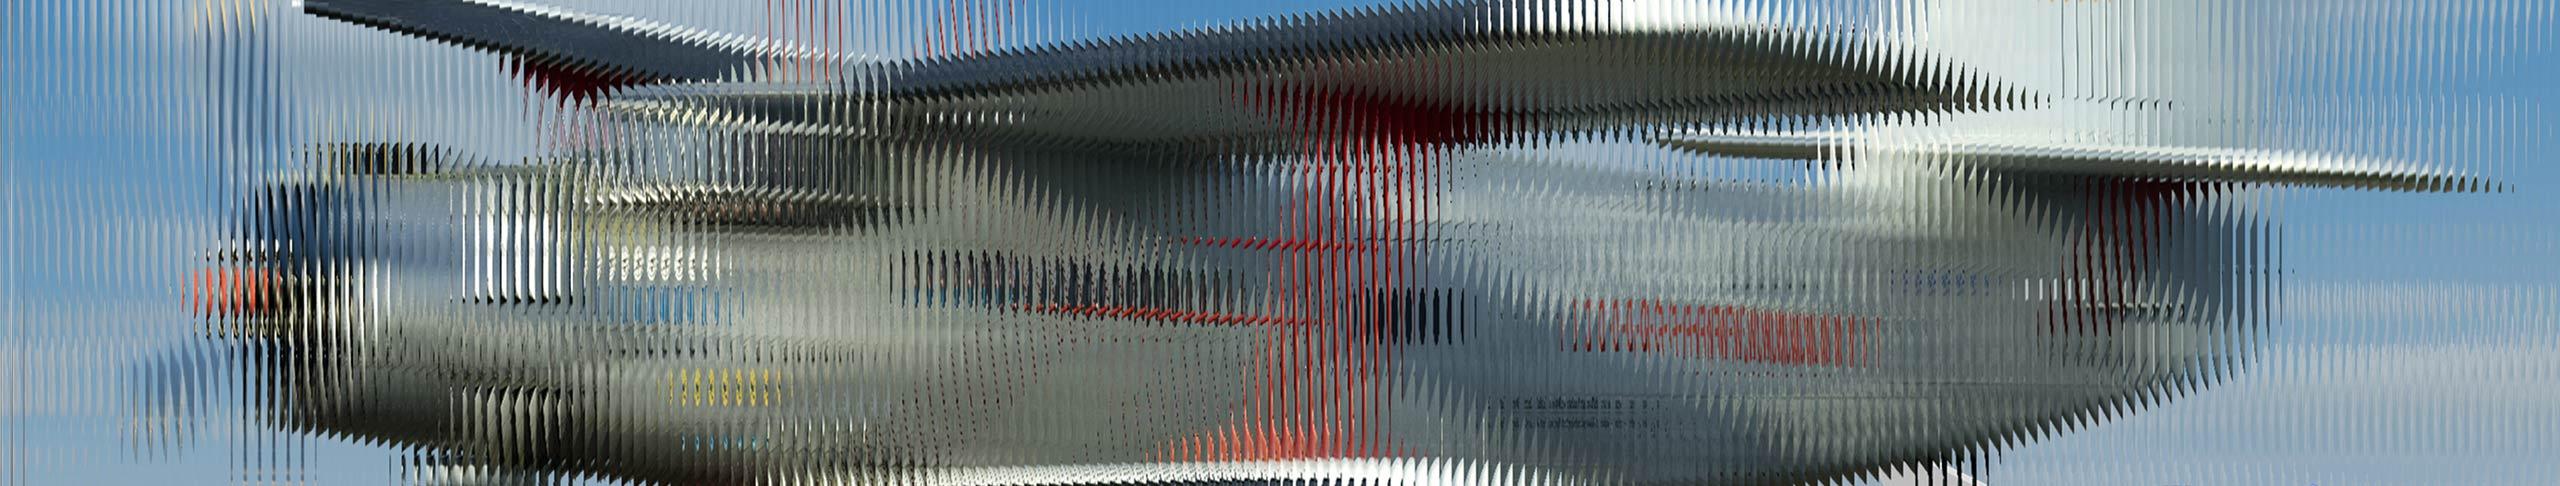 Lentikular-Technik - interlaced image